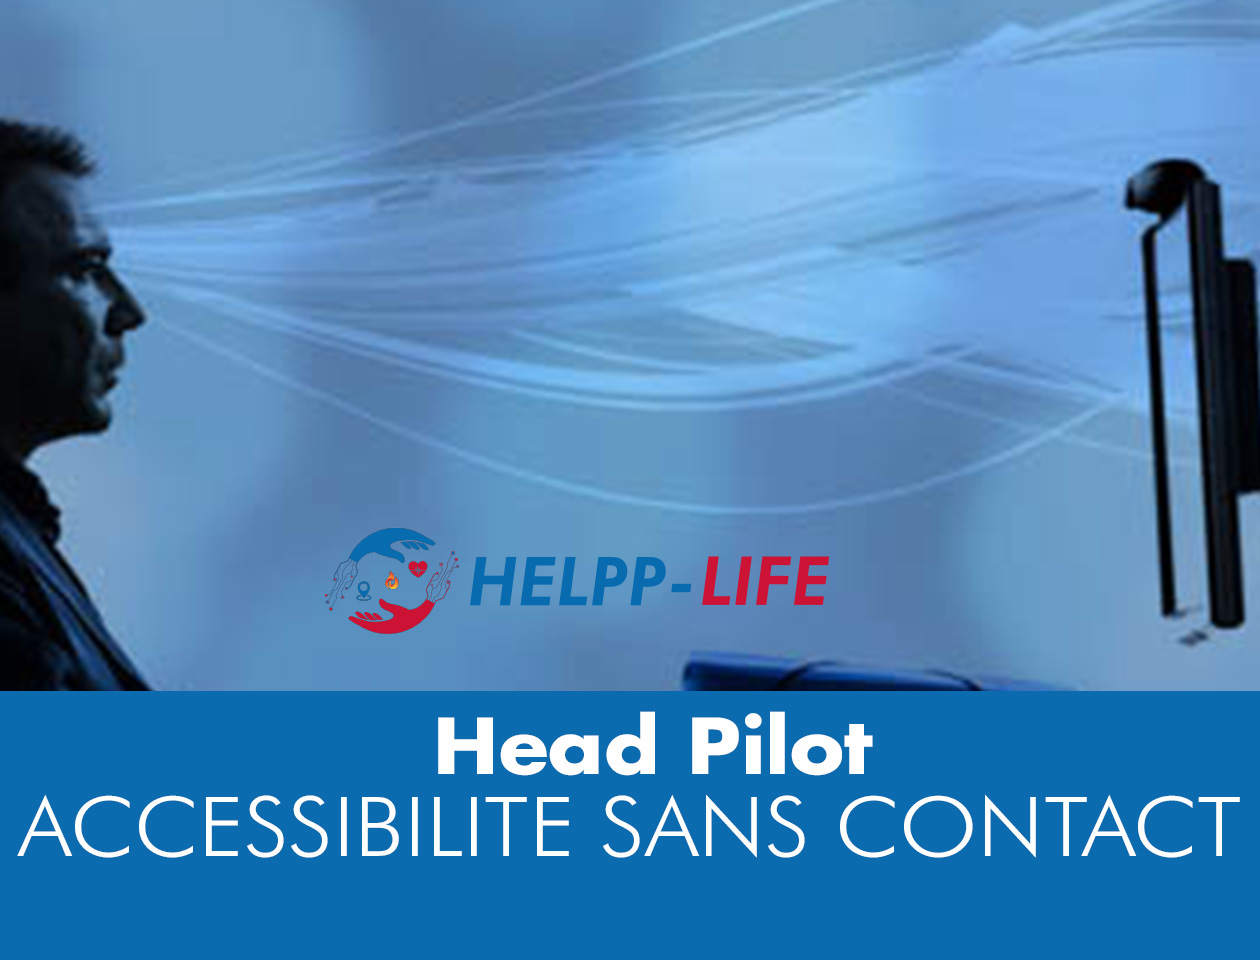 helpp-life HeadPilot